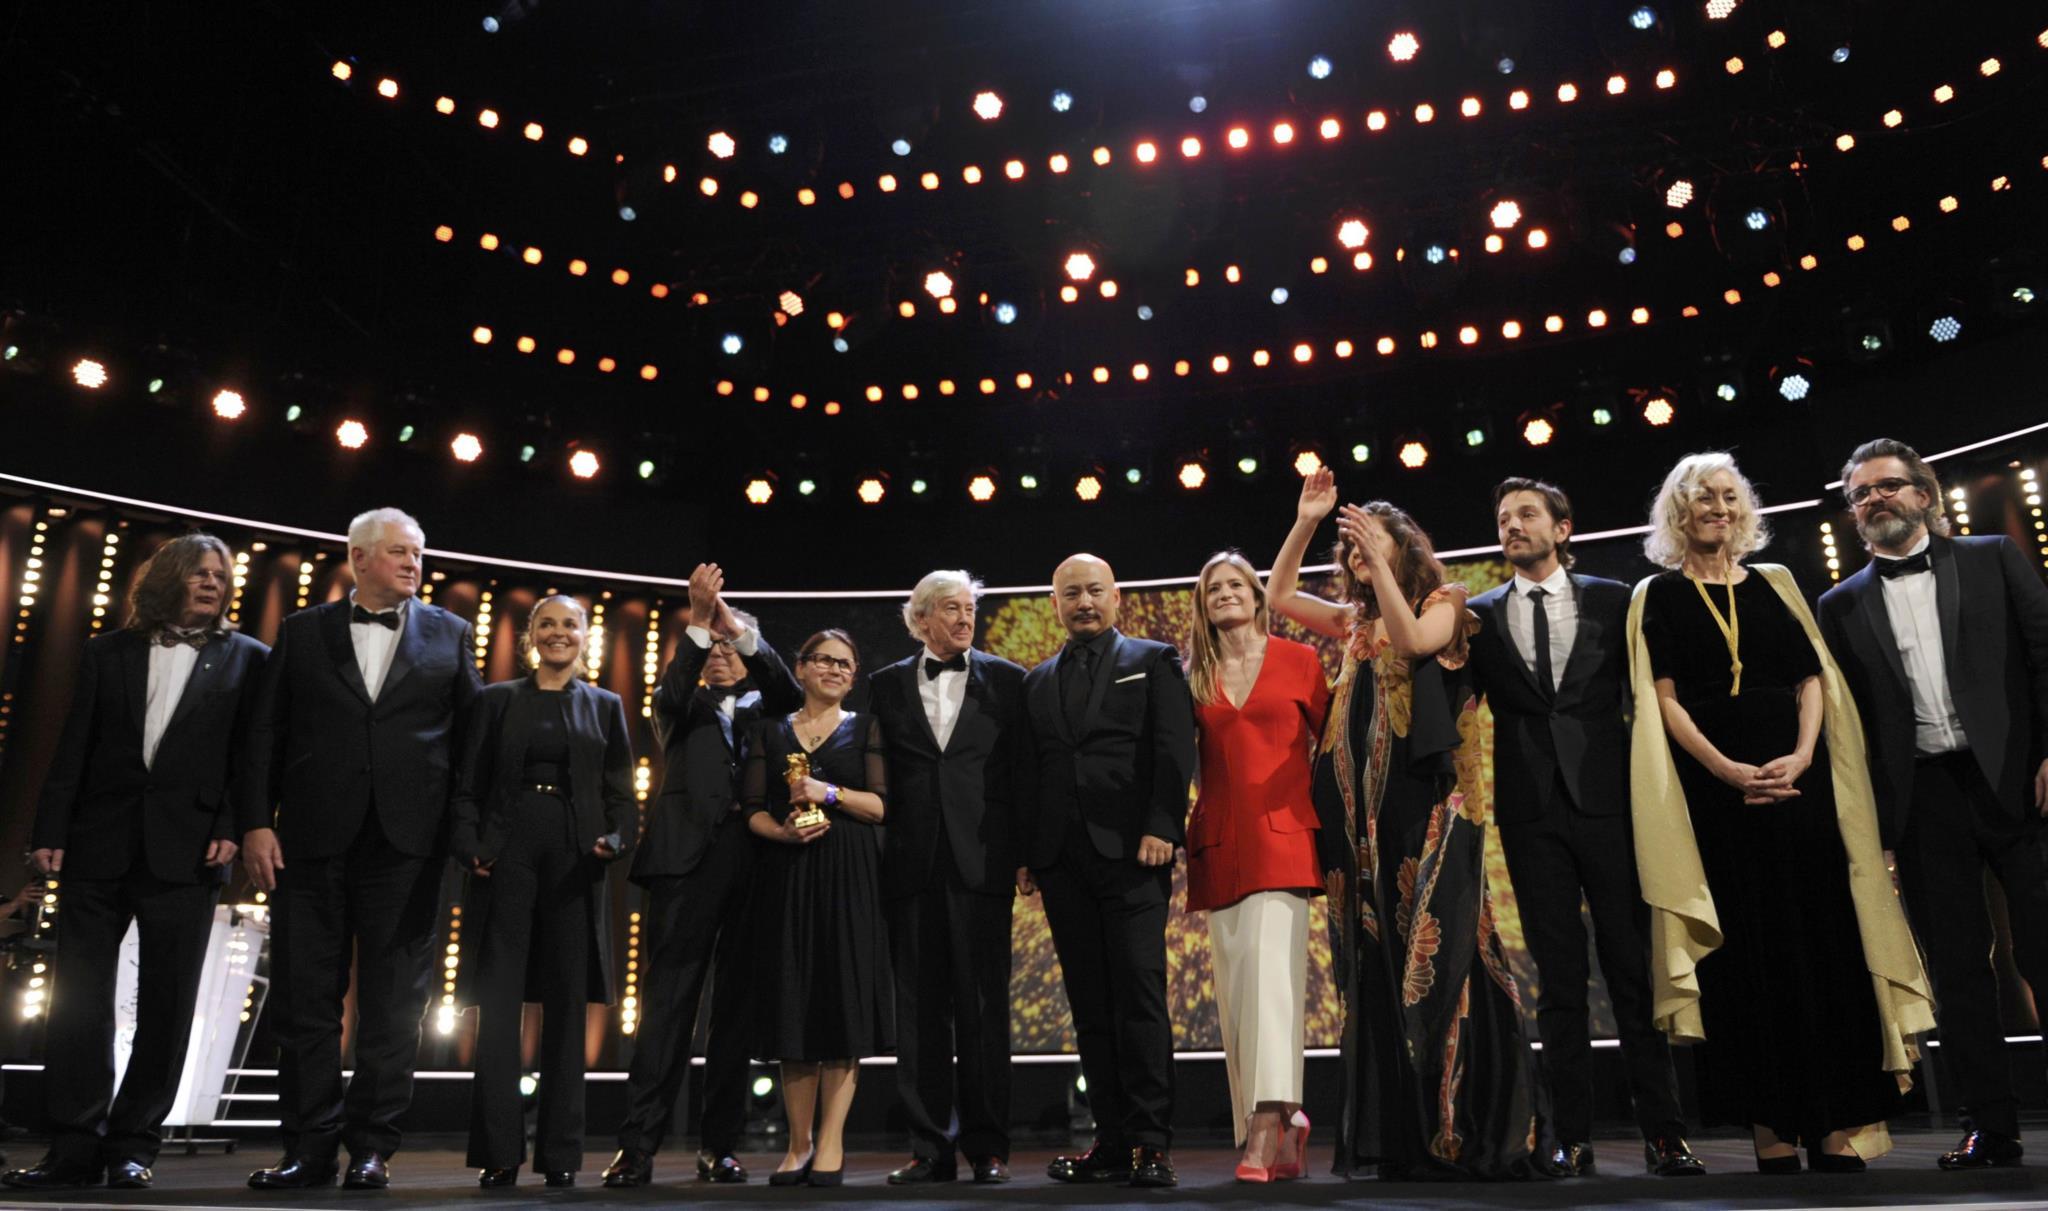 PÚBLICO - Palmarés da 67.ª Berlinale